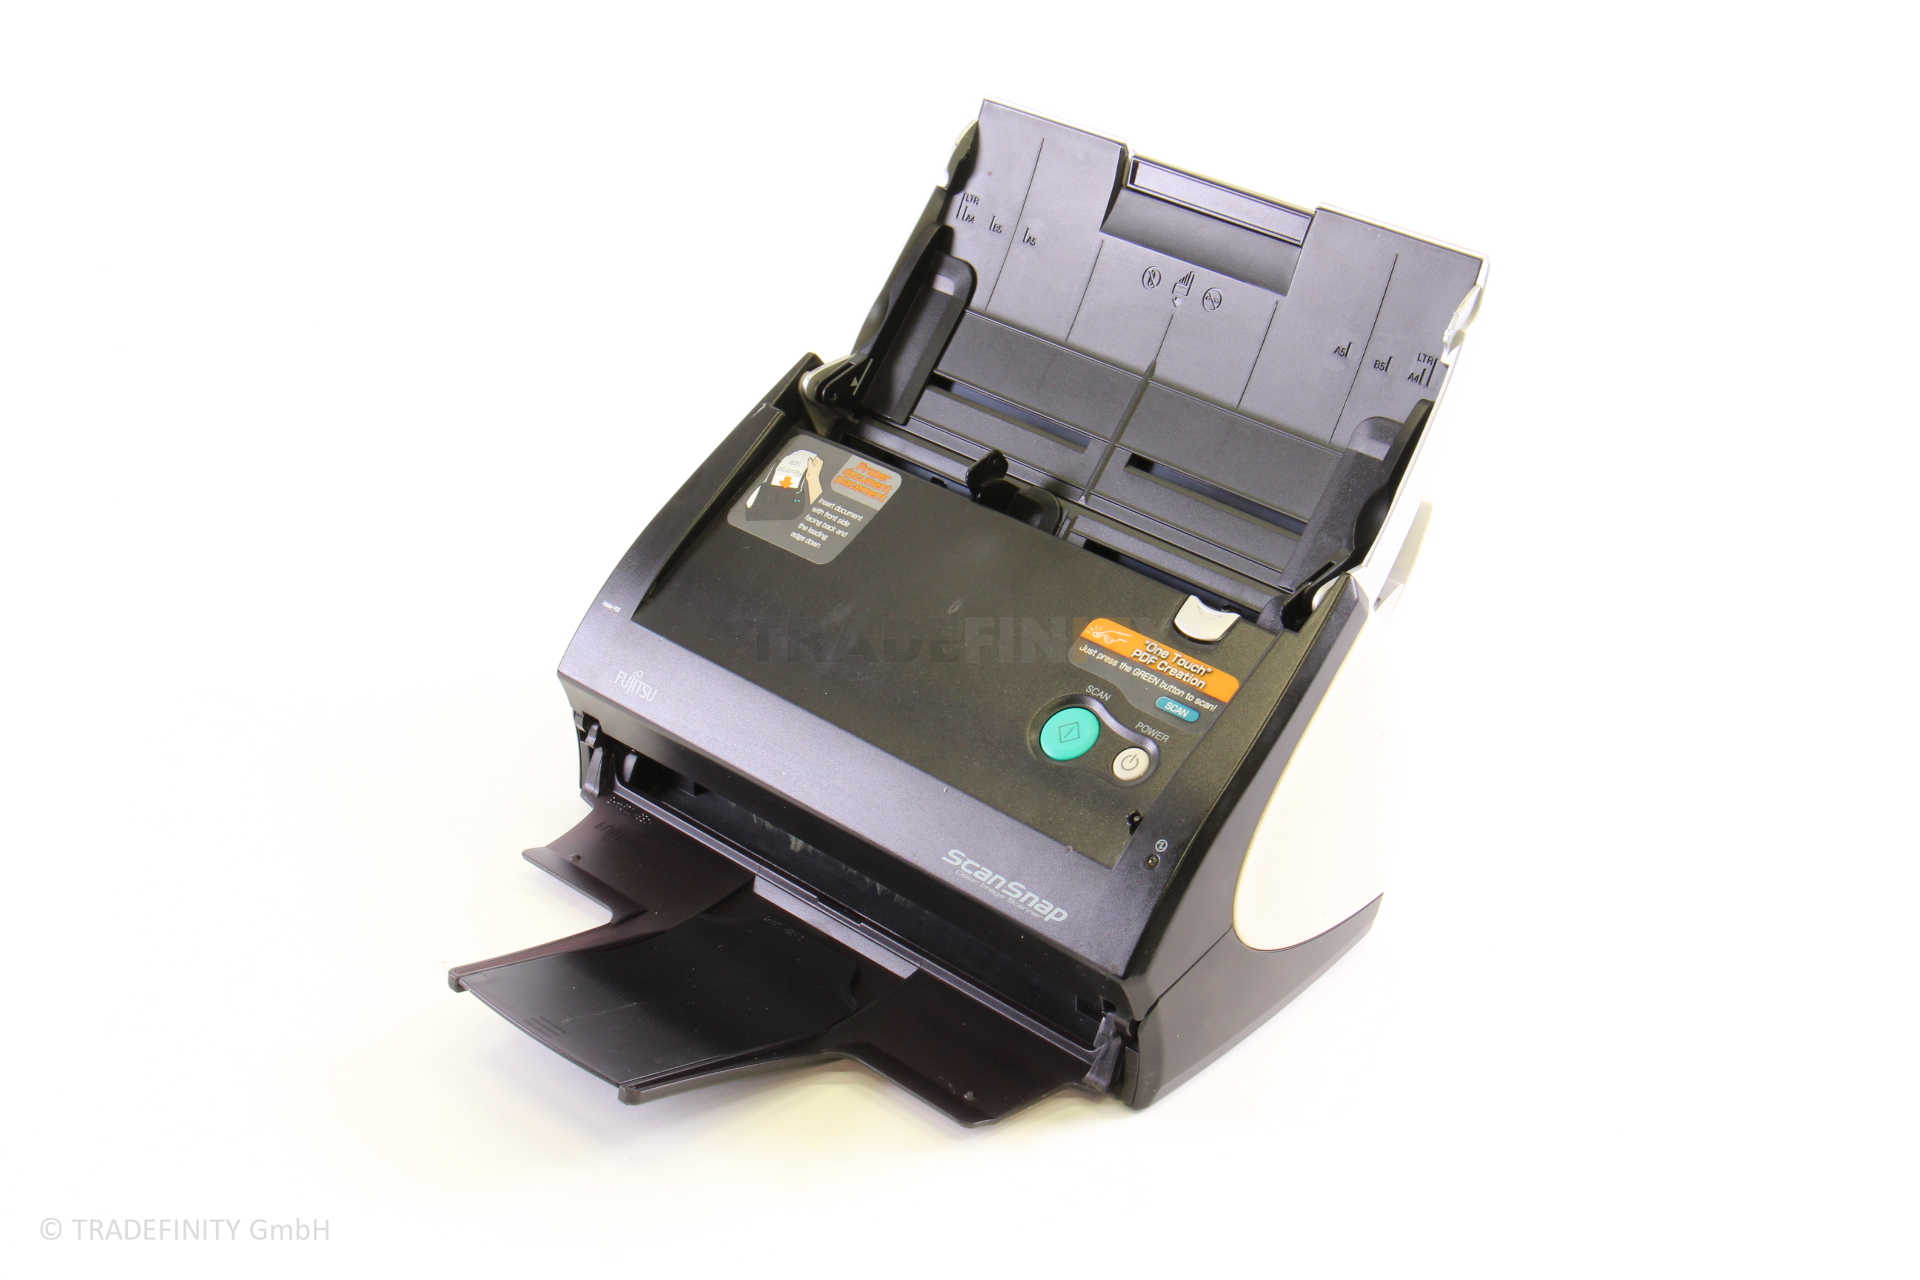 ScanSnap S500 ADF (Automatic Document Feeder), Duplex Scanning